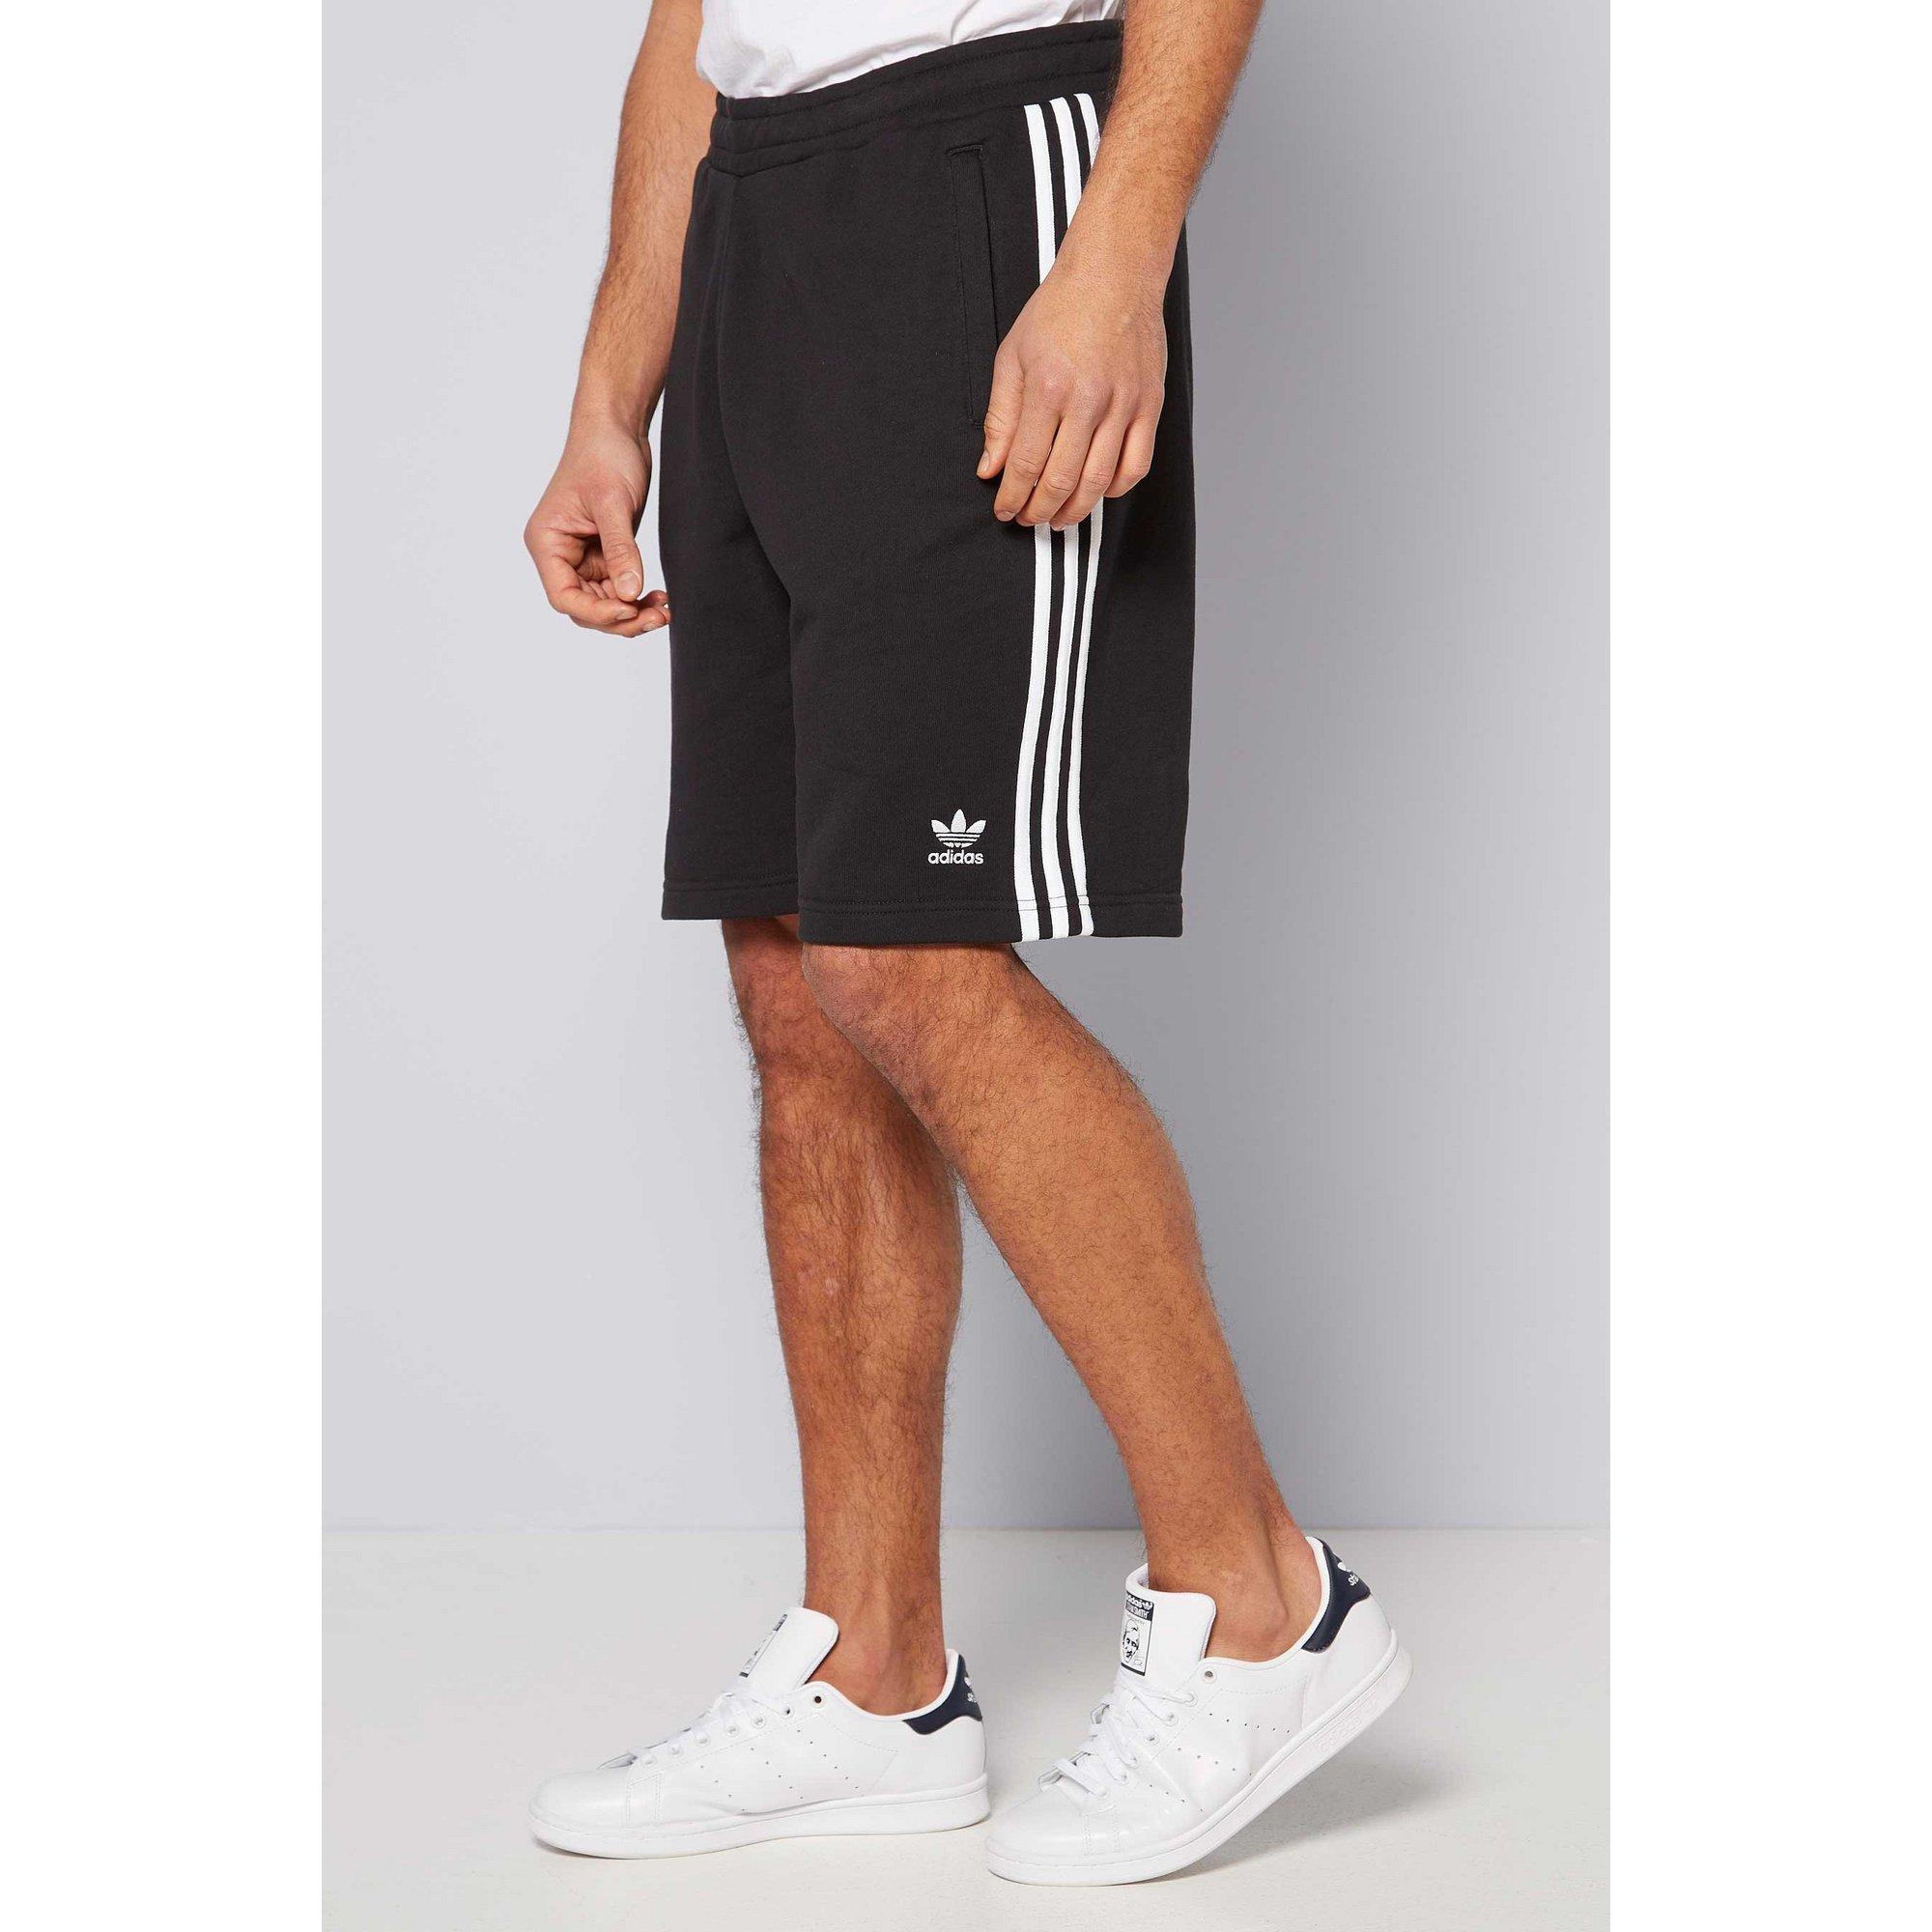 Image of adidas Originals 3 Stripes Shorts